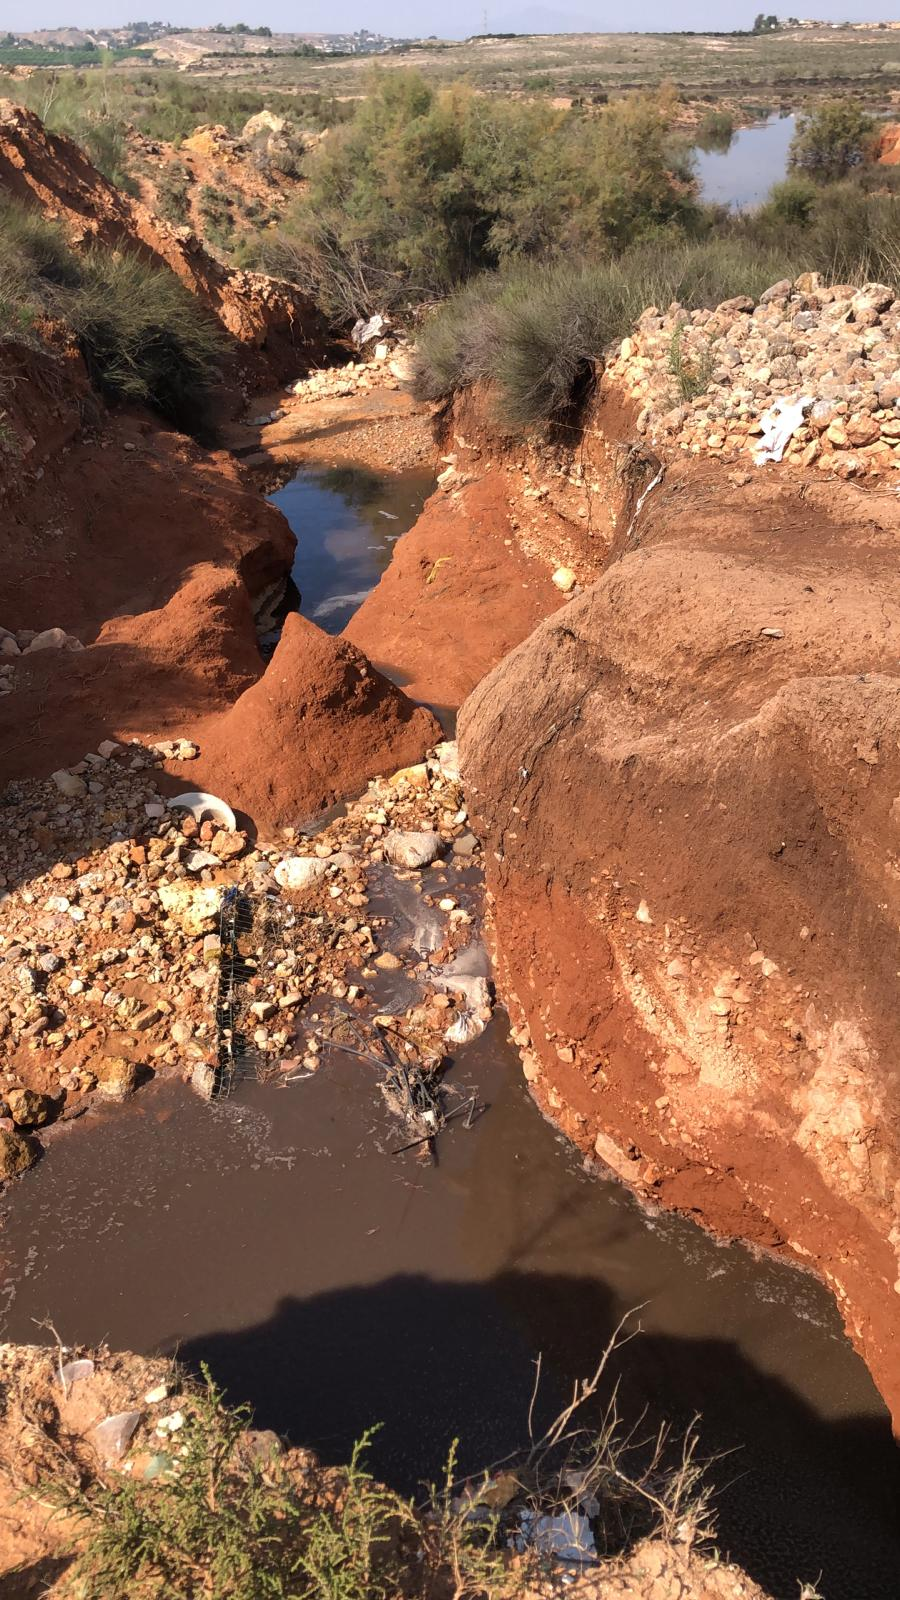 Vertido de purines al embalse de Santomera. Imagen: EEA